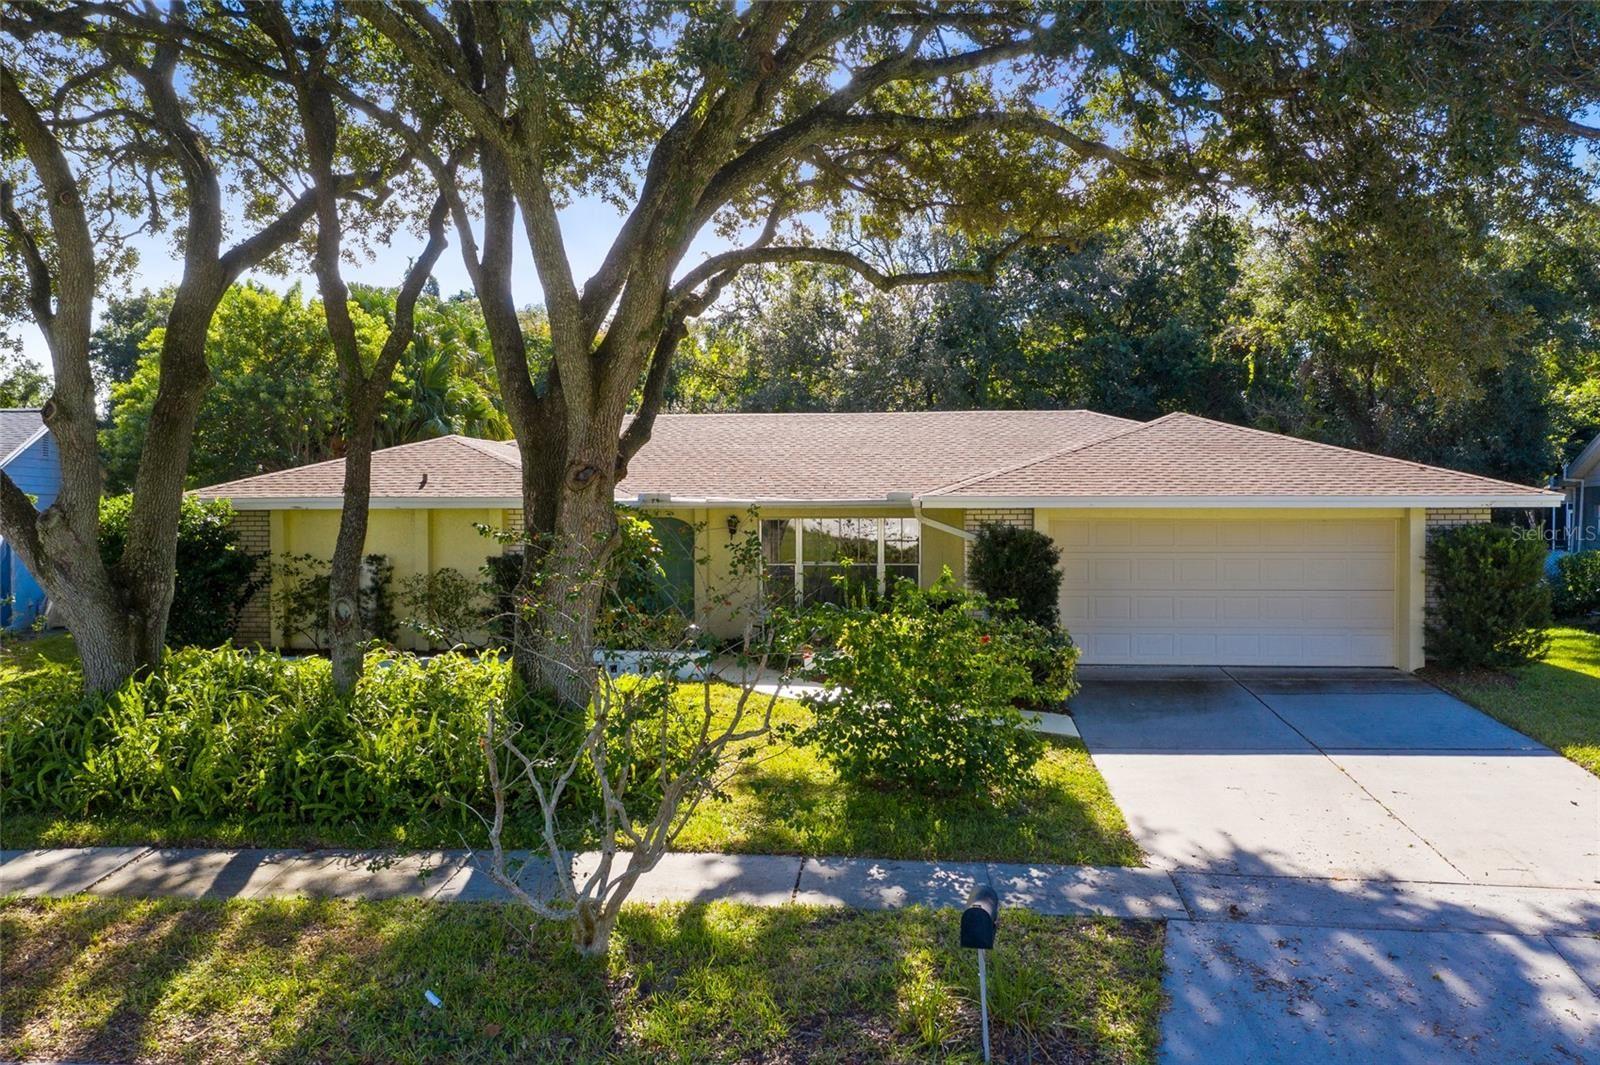 745 LITTLE WEKIVA CIRCLE, Altamonte Springs, FL 32714 - #: O5978994